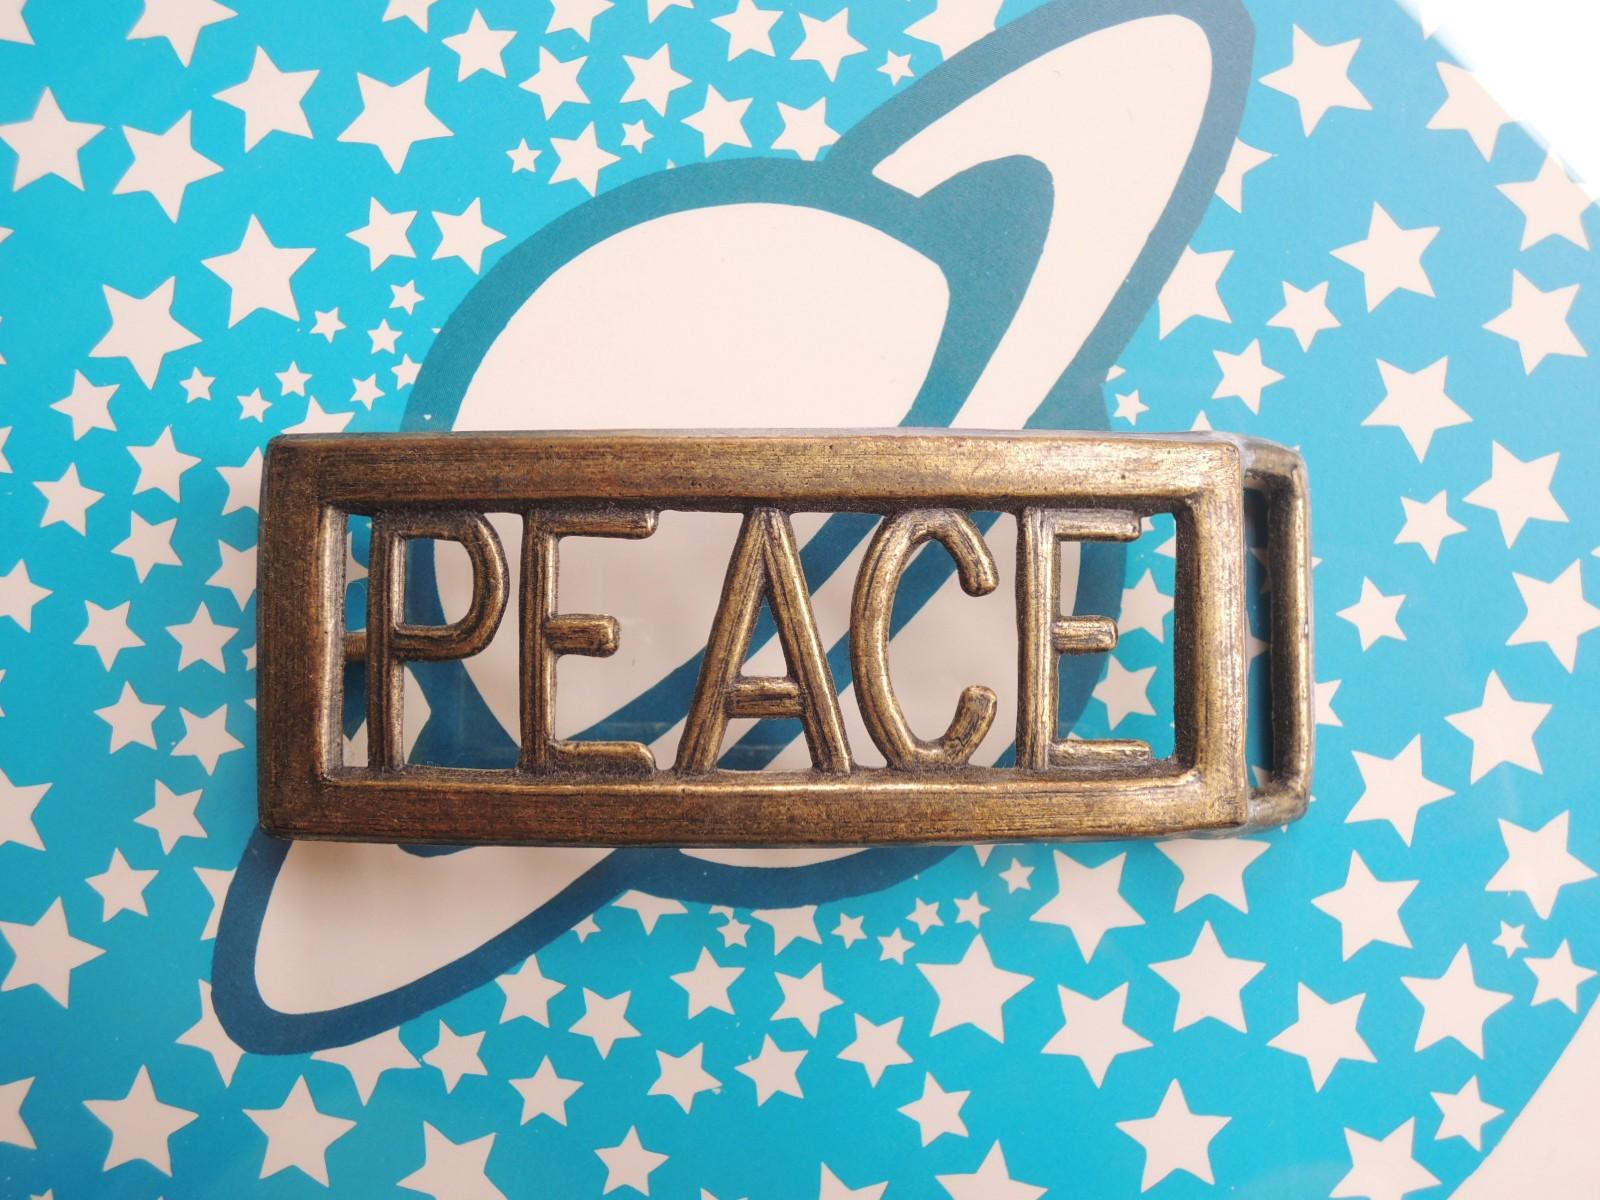 peacebeltbuckles02_01.JPG